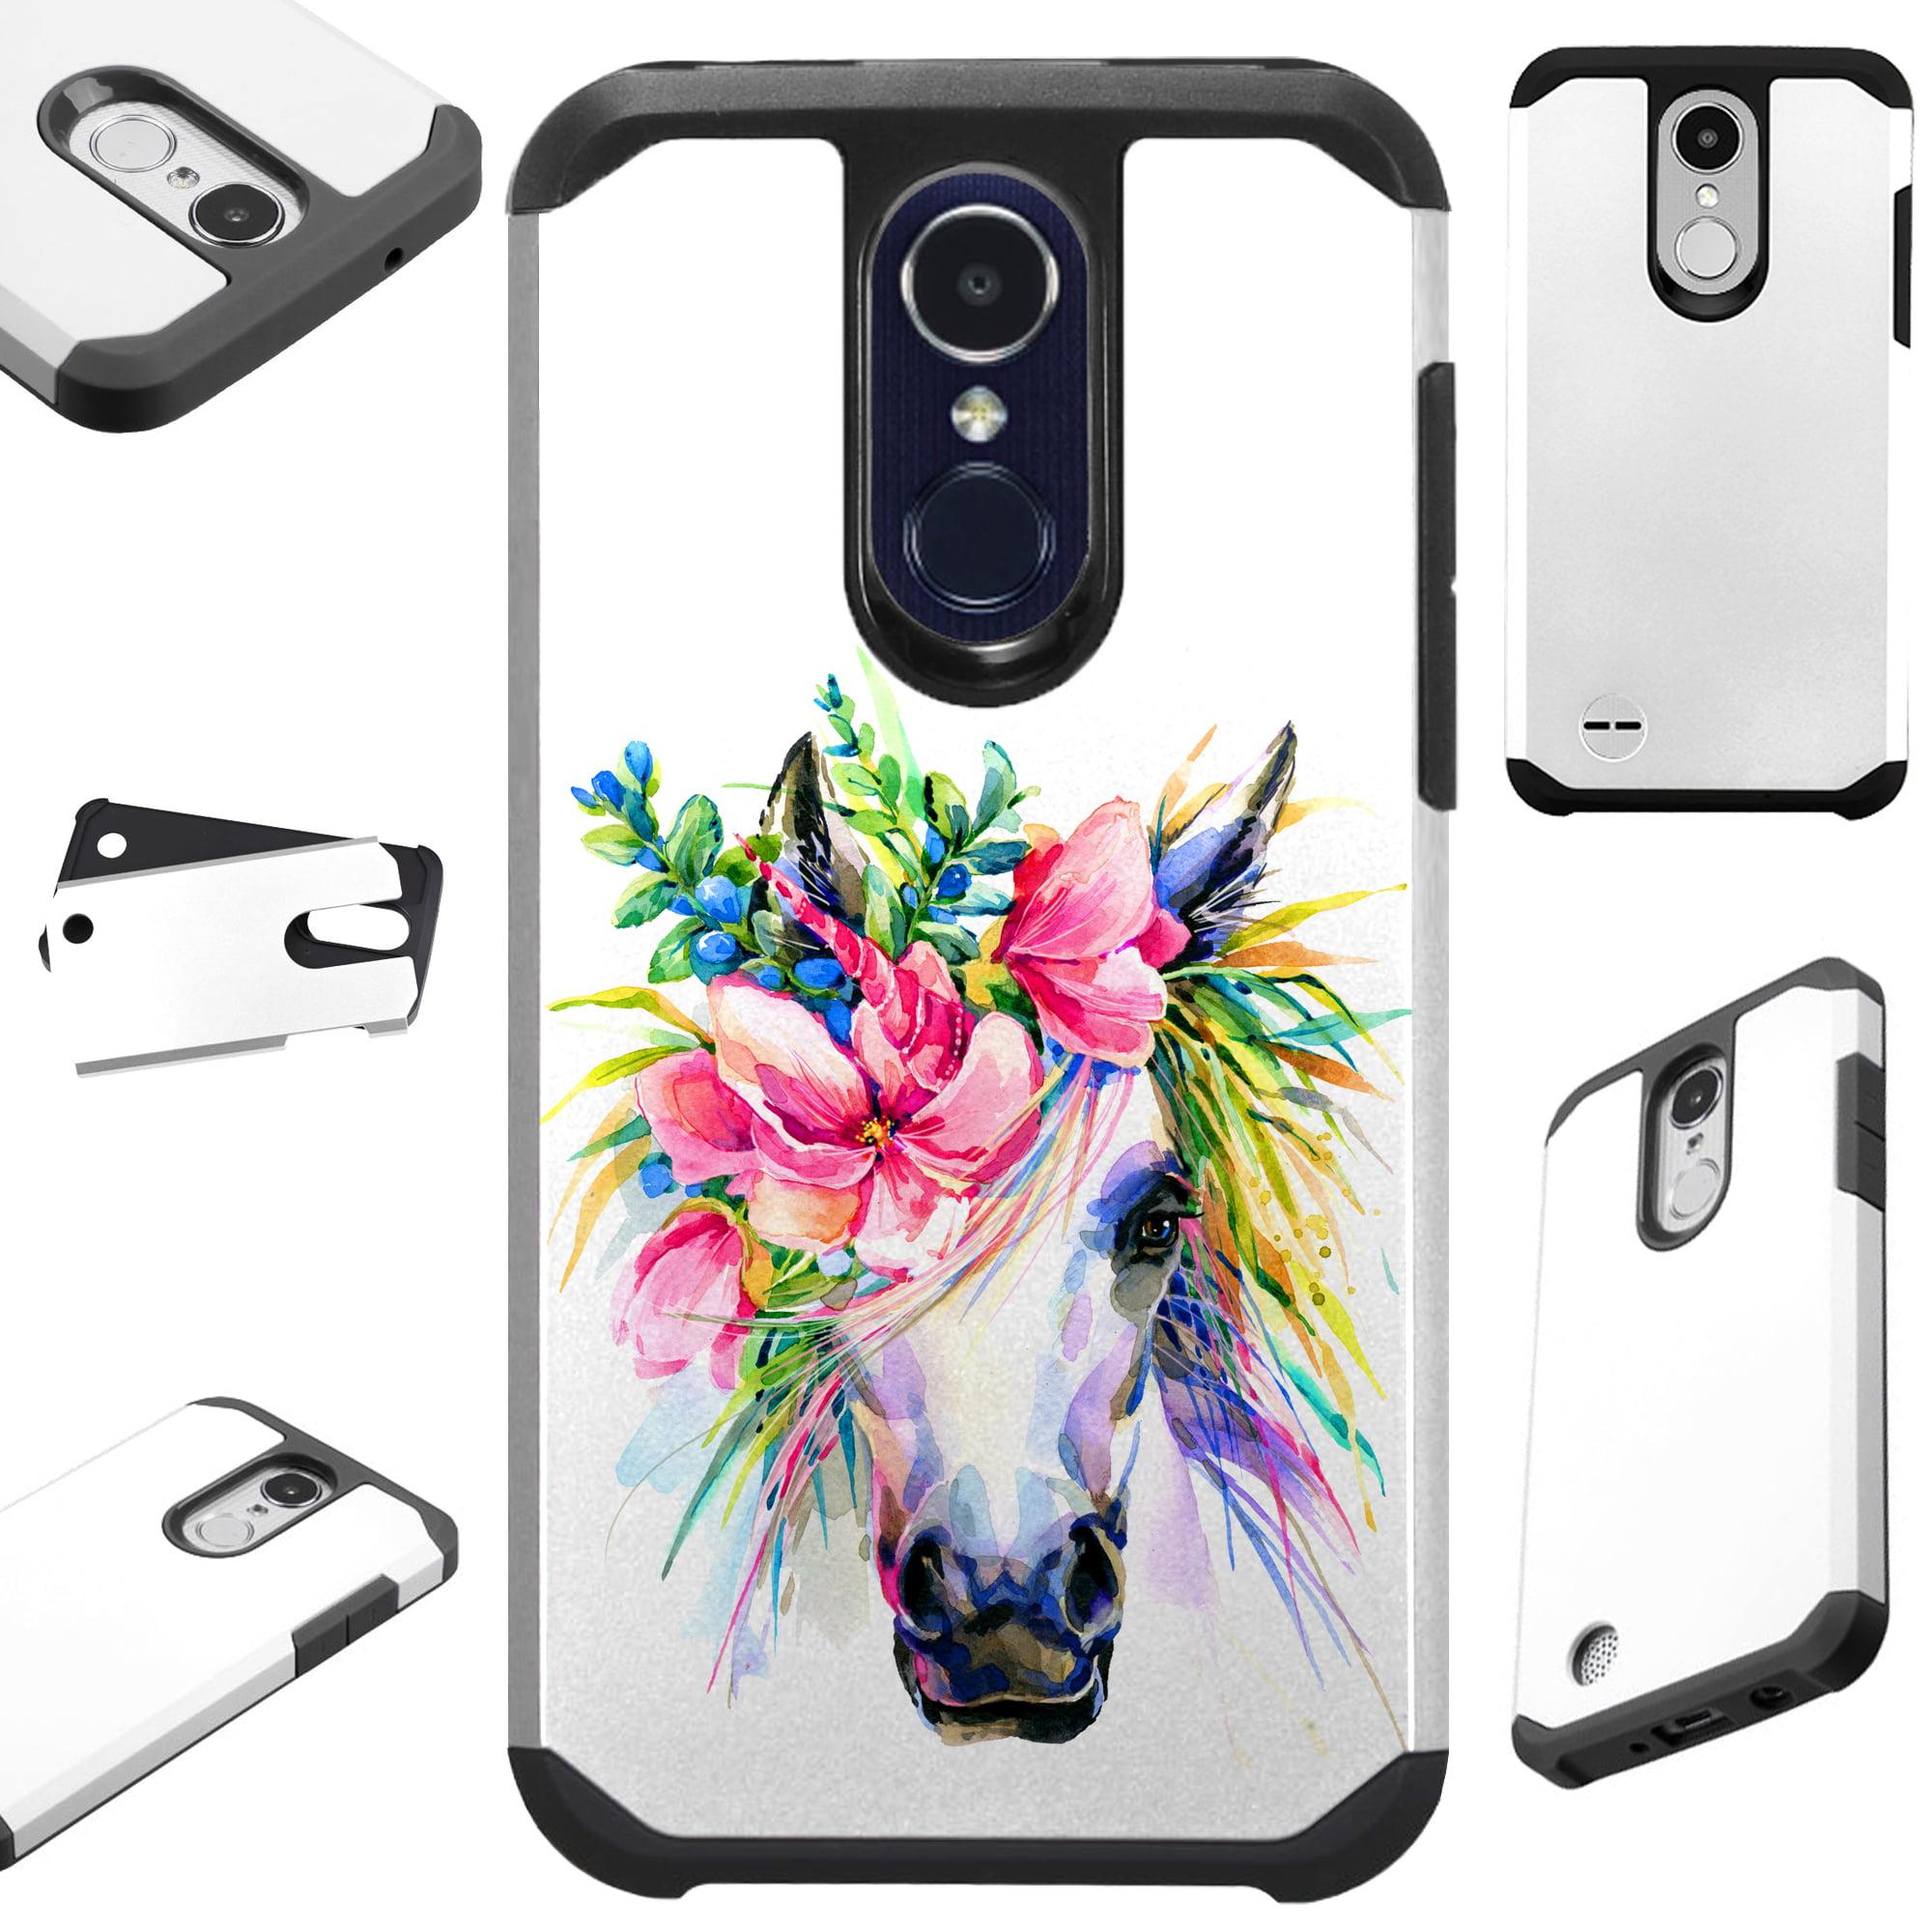 FusionGuard Phone Case Cover For LG K30 X410 | K10 (2018) | K10 Plus | K10 Alpha (Unicorn Flower)